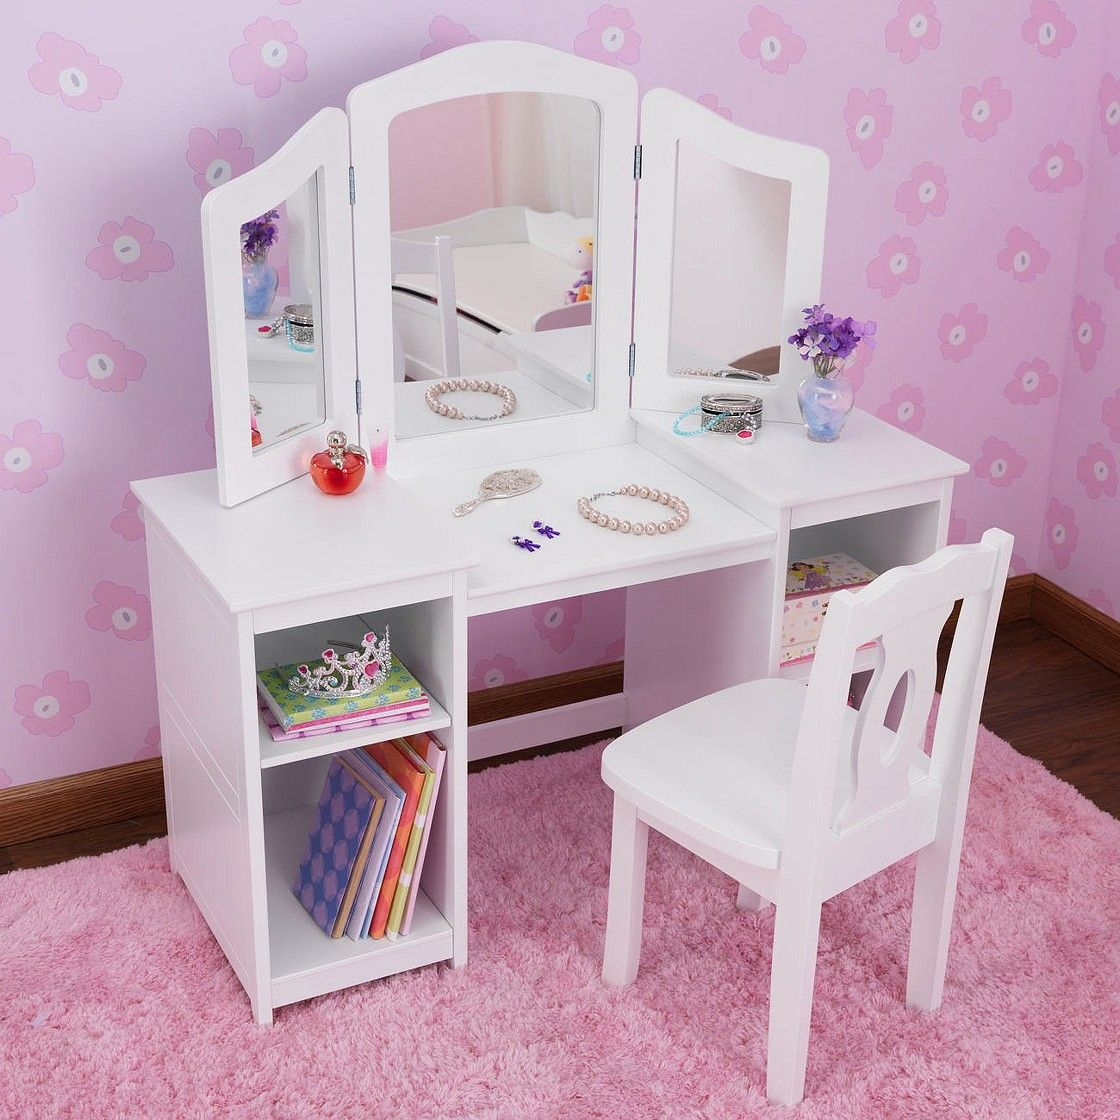 Kidkraft Deluxe Vanity Table With Chair - White Divas